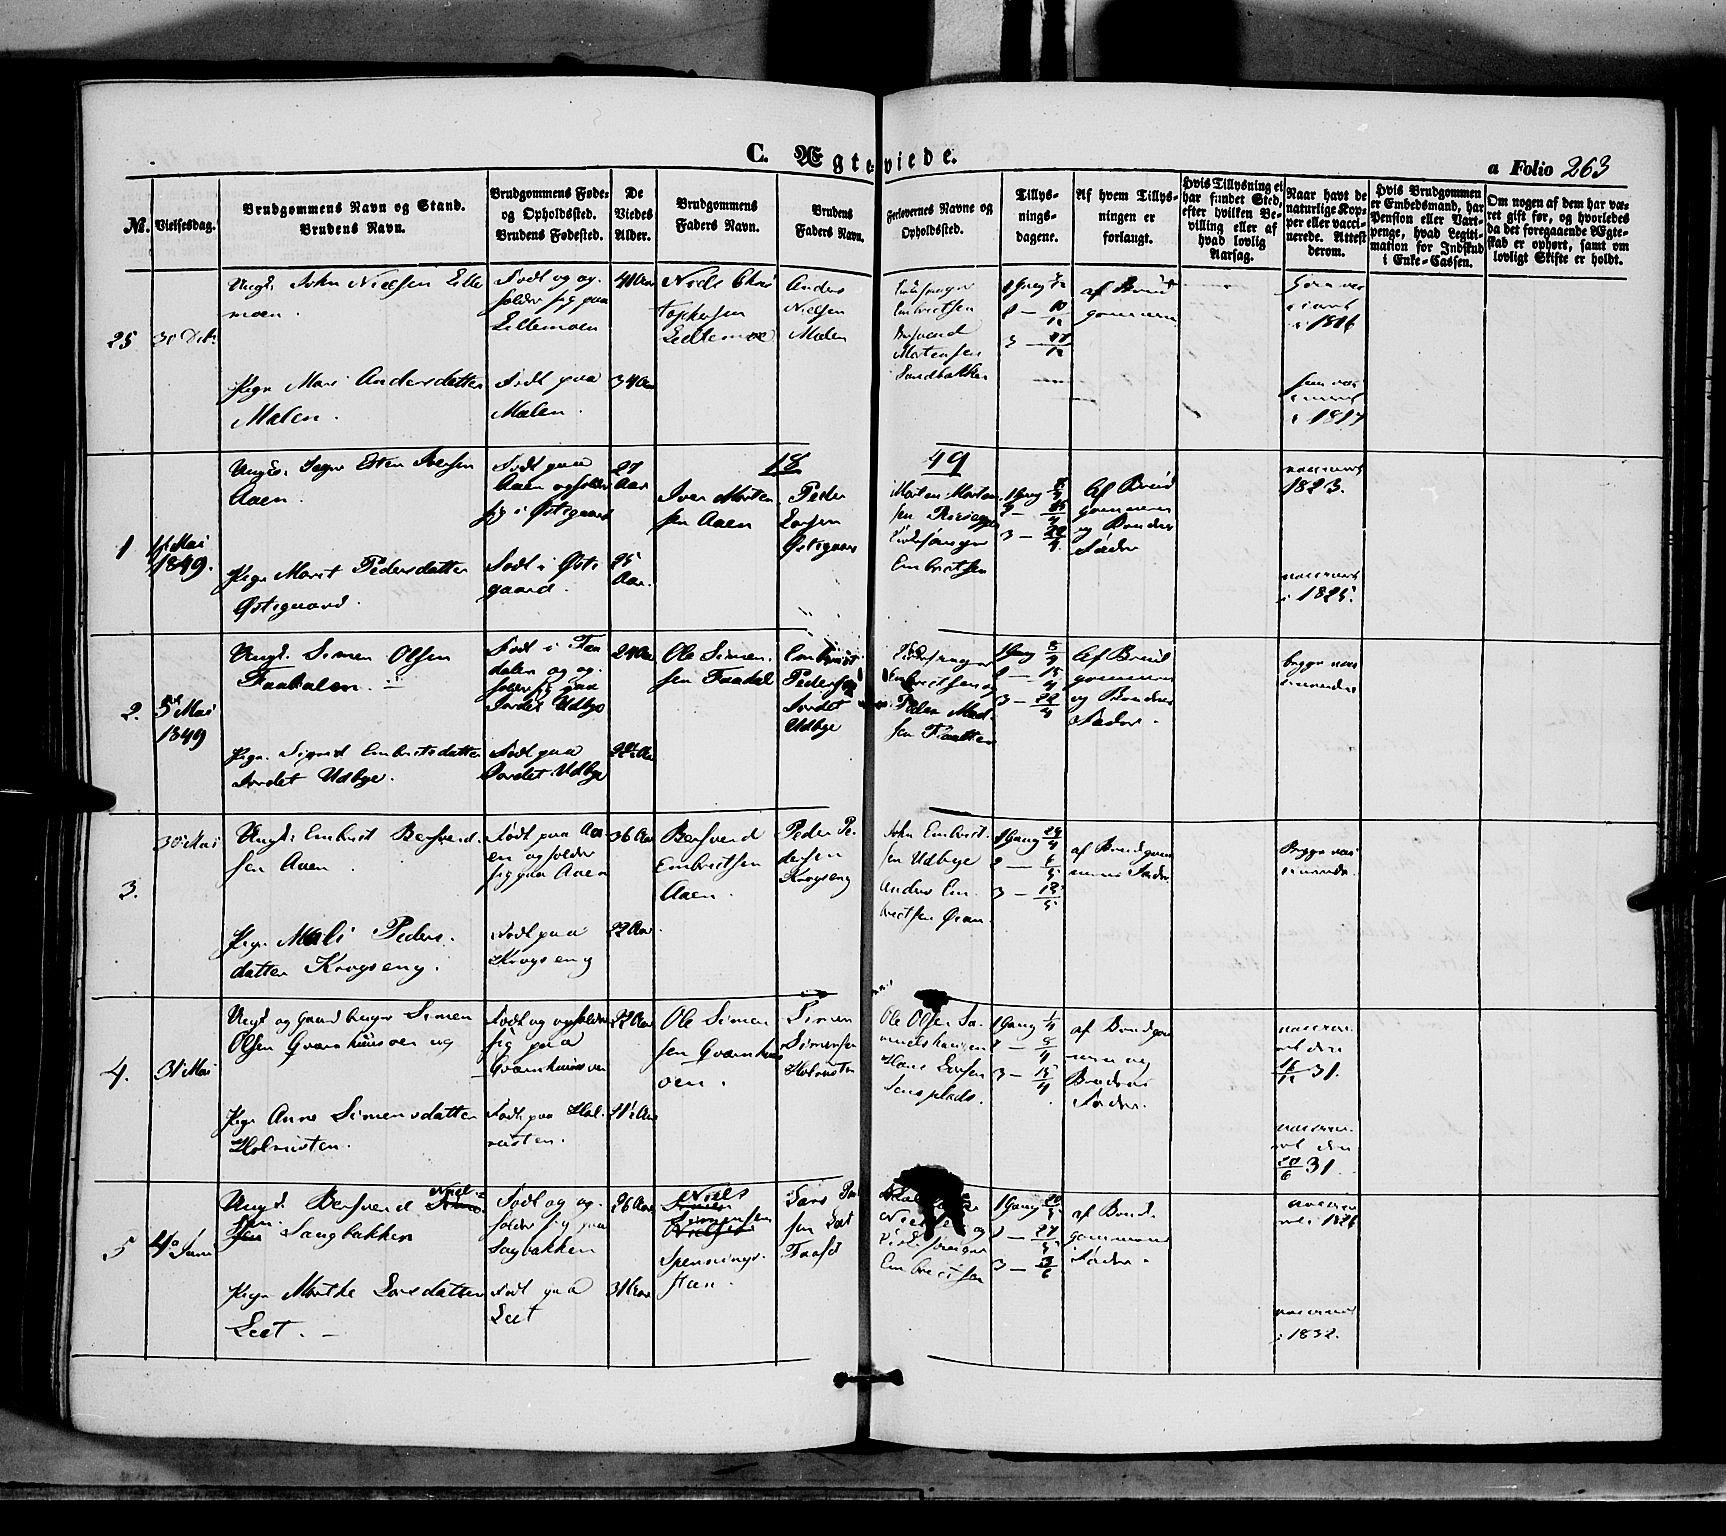 SAH, Tynset prestekontor, Ministerialbok nr. 20, 1848-1862, s. 263